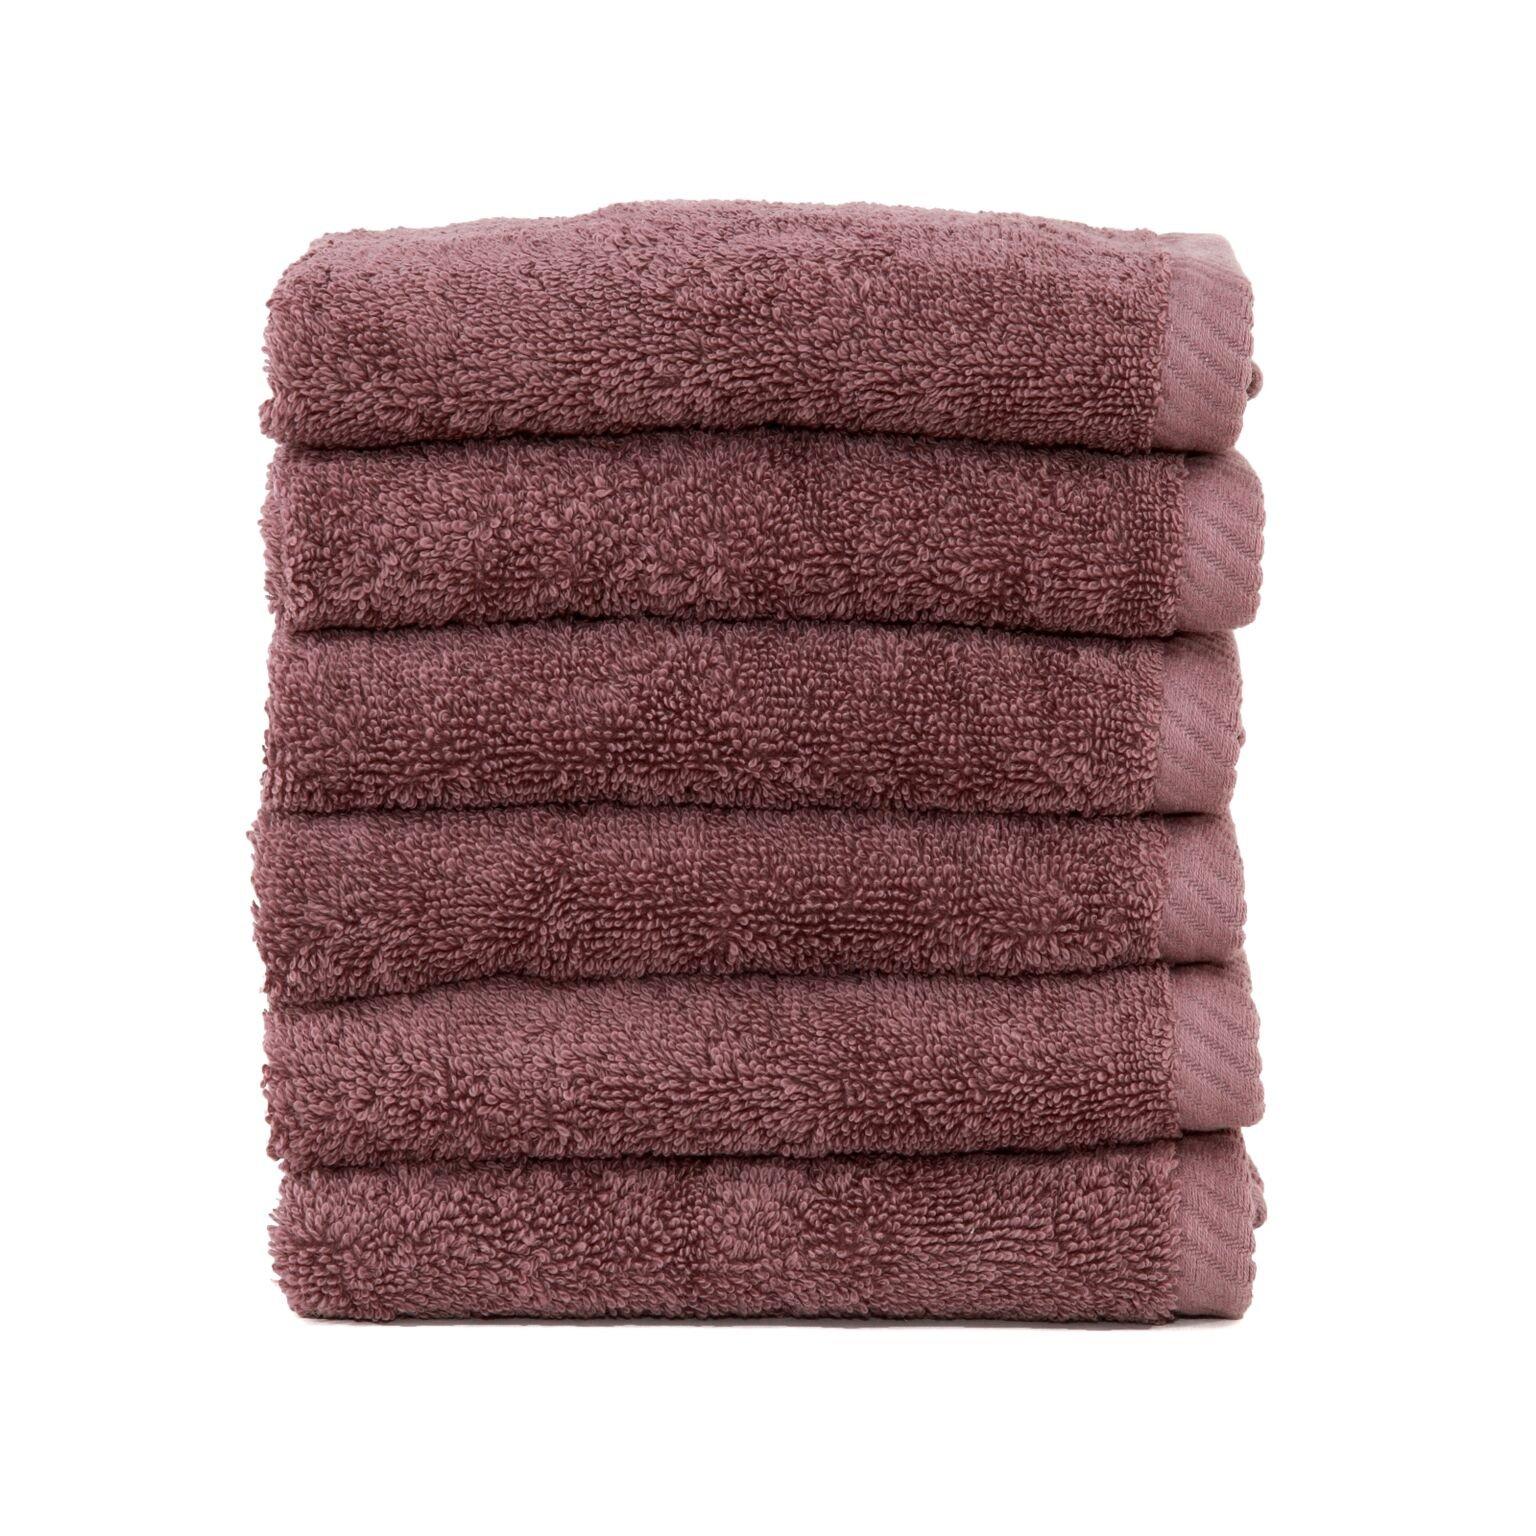 Linum Home Textiles Soft Twist Premium Authentic Soft 100% Turkish Cotton Luxury Hotel Collection Washcloth, Set of 6, Sugar Plum